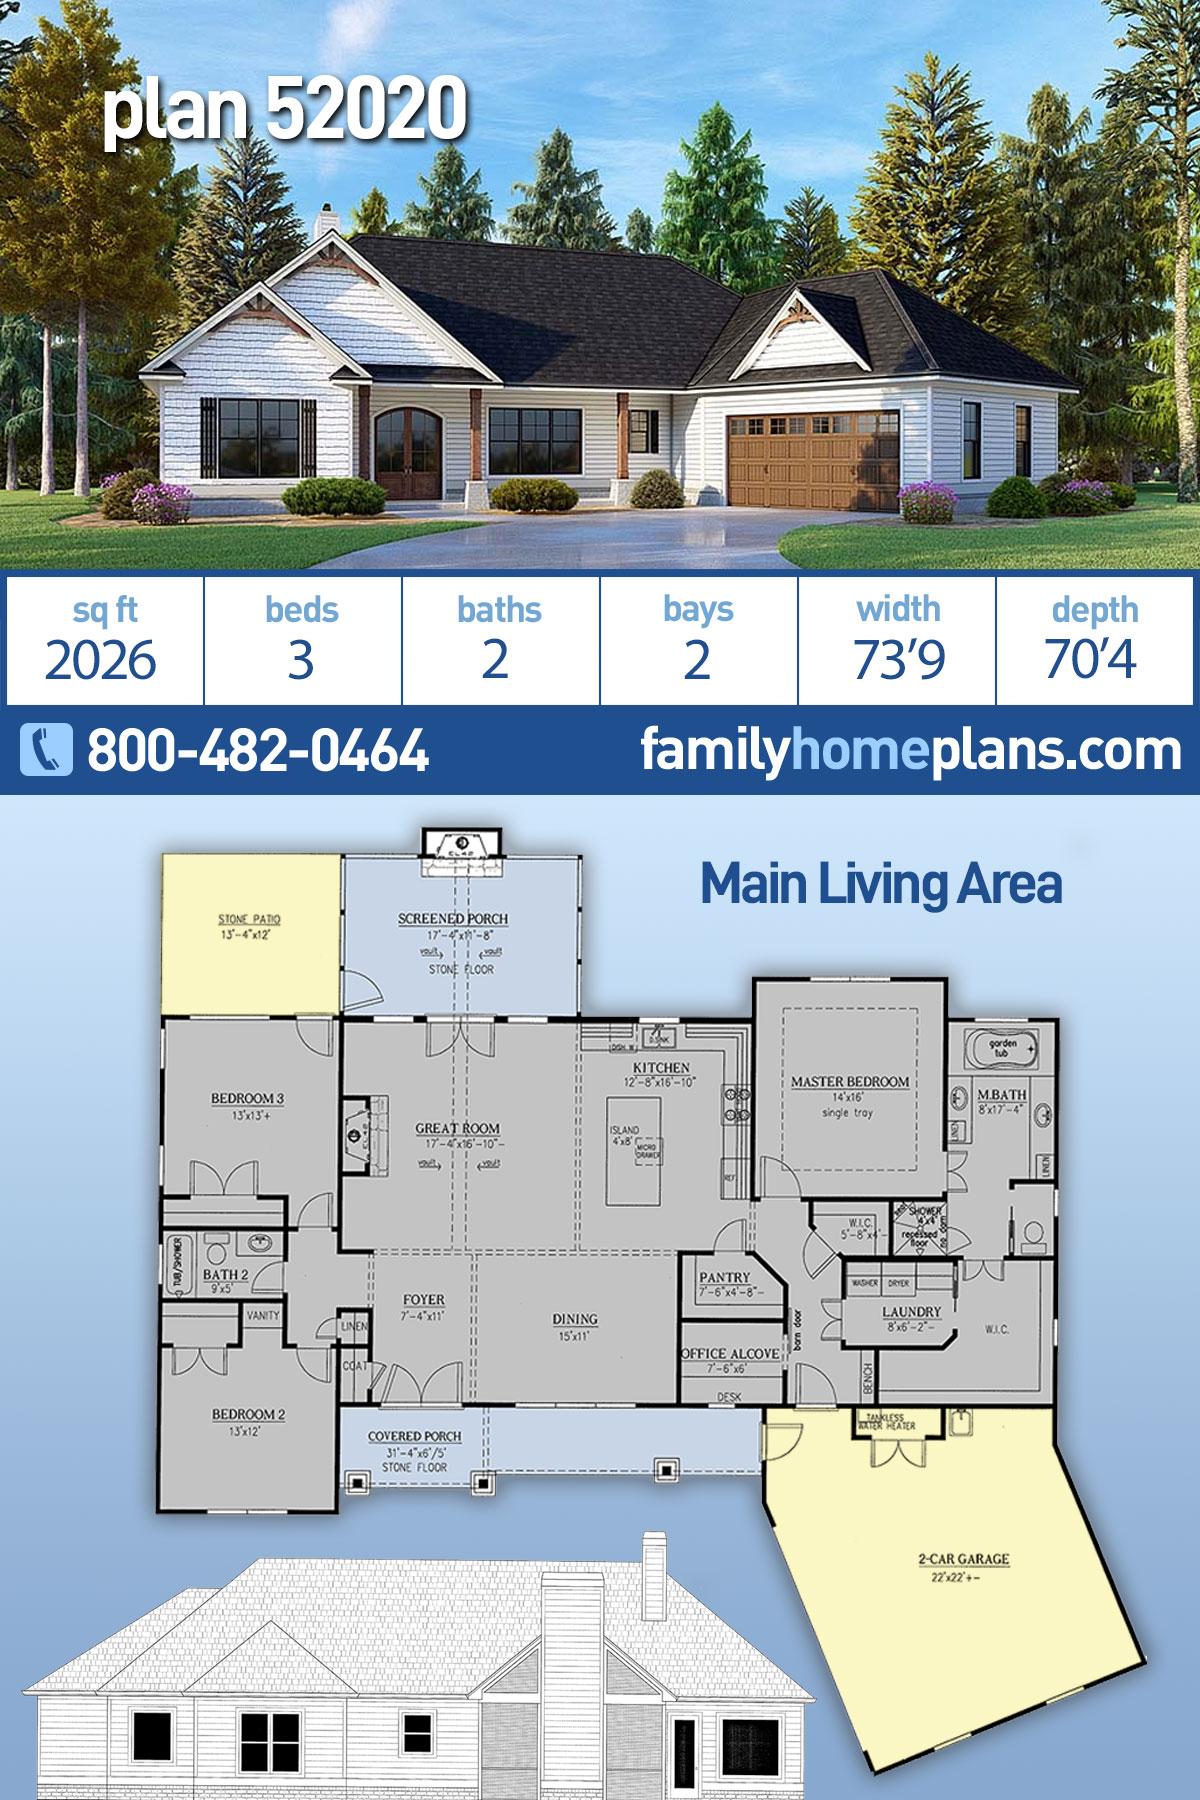 Craftsman House Plan 52020 with 3 Beds, 2 Baths, 2 Car Garage